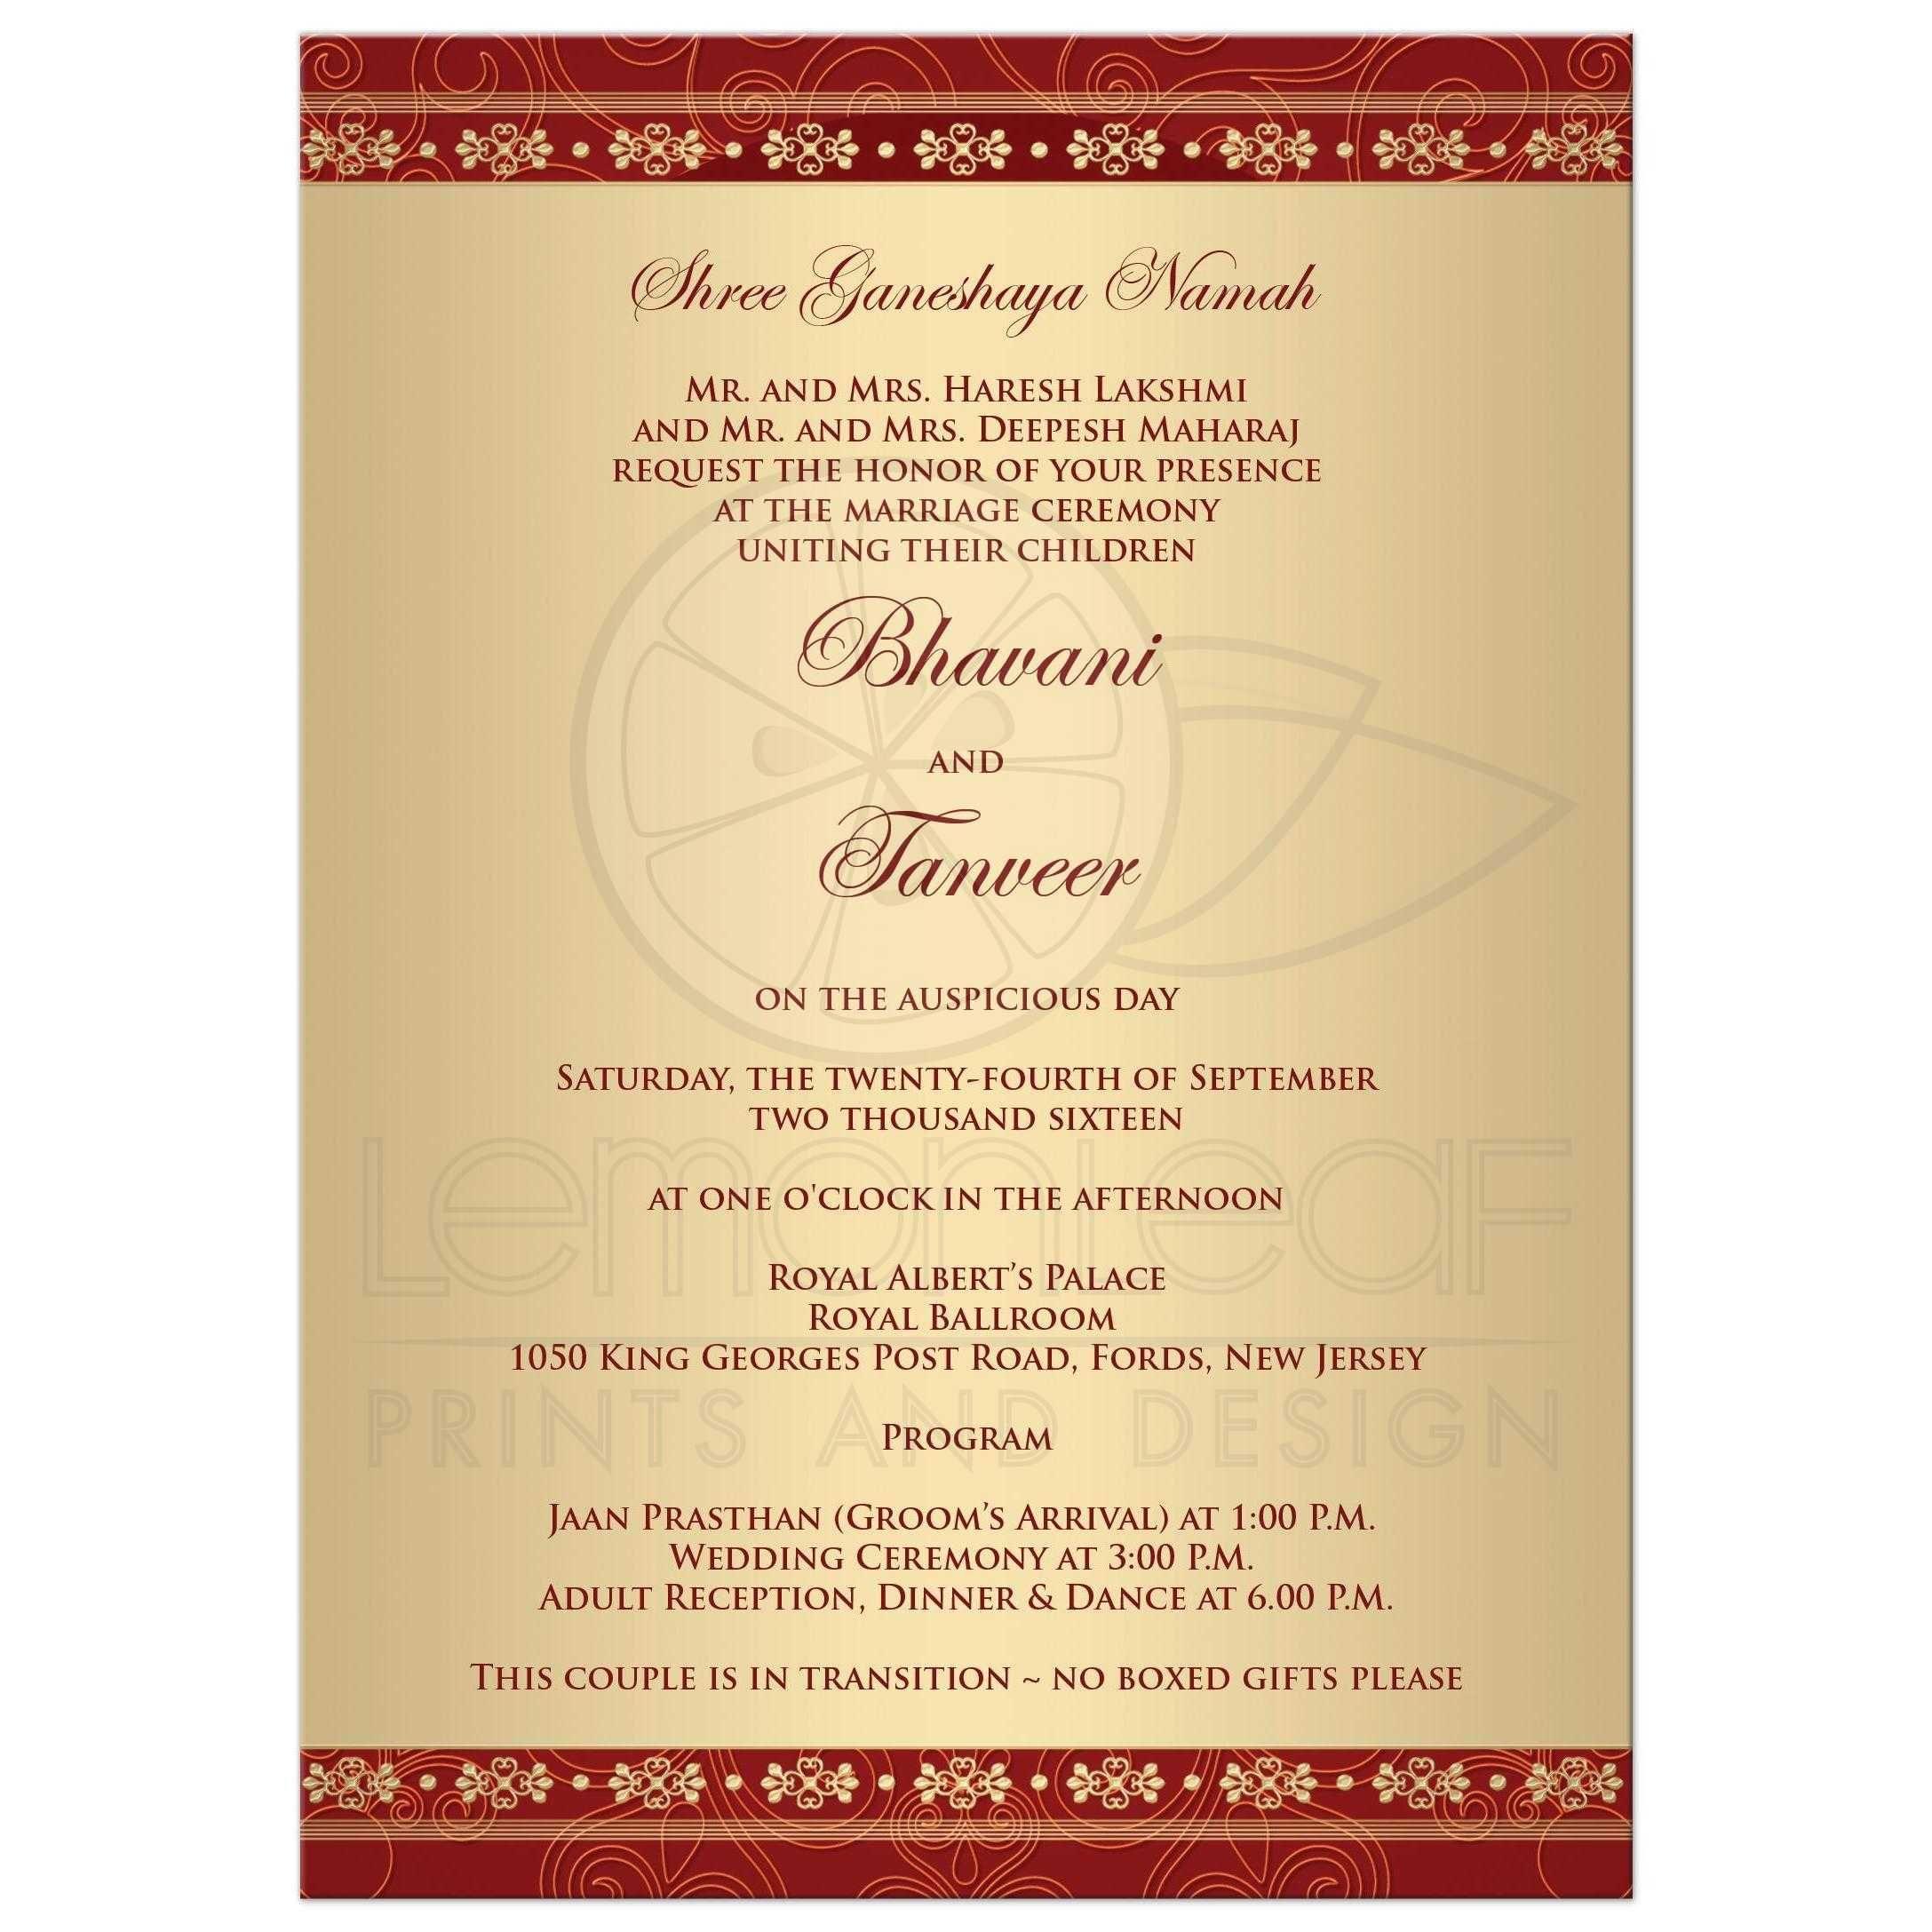 wedding invitation : indian wedding invitation cards - Superb ...